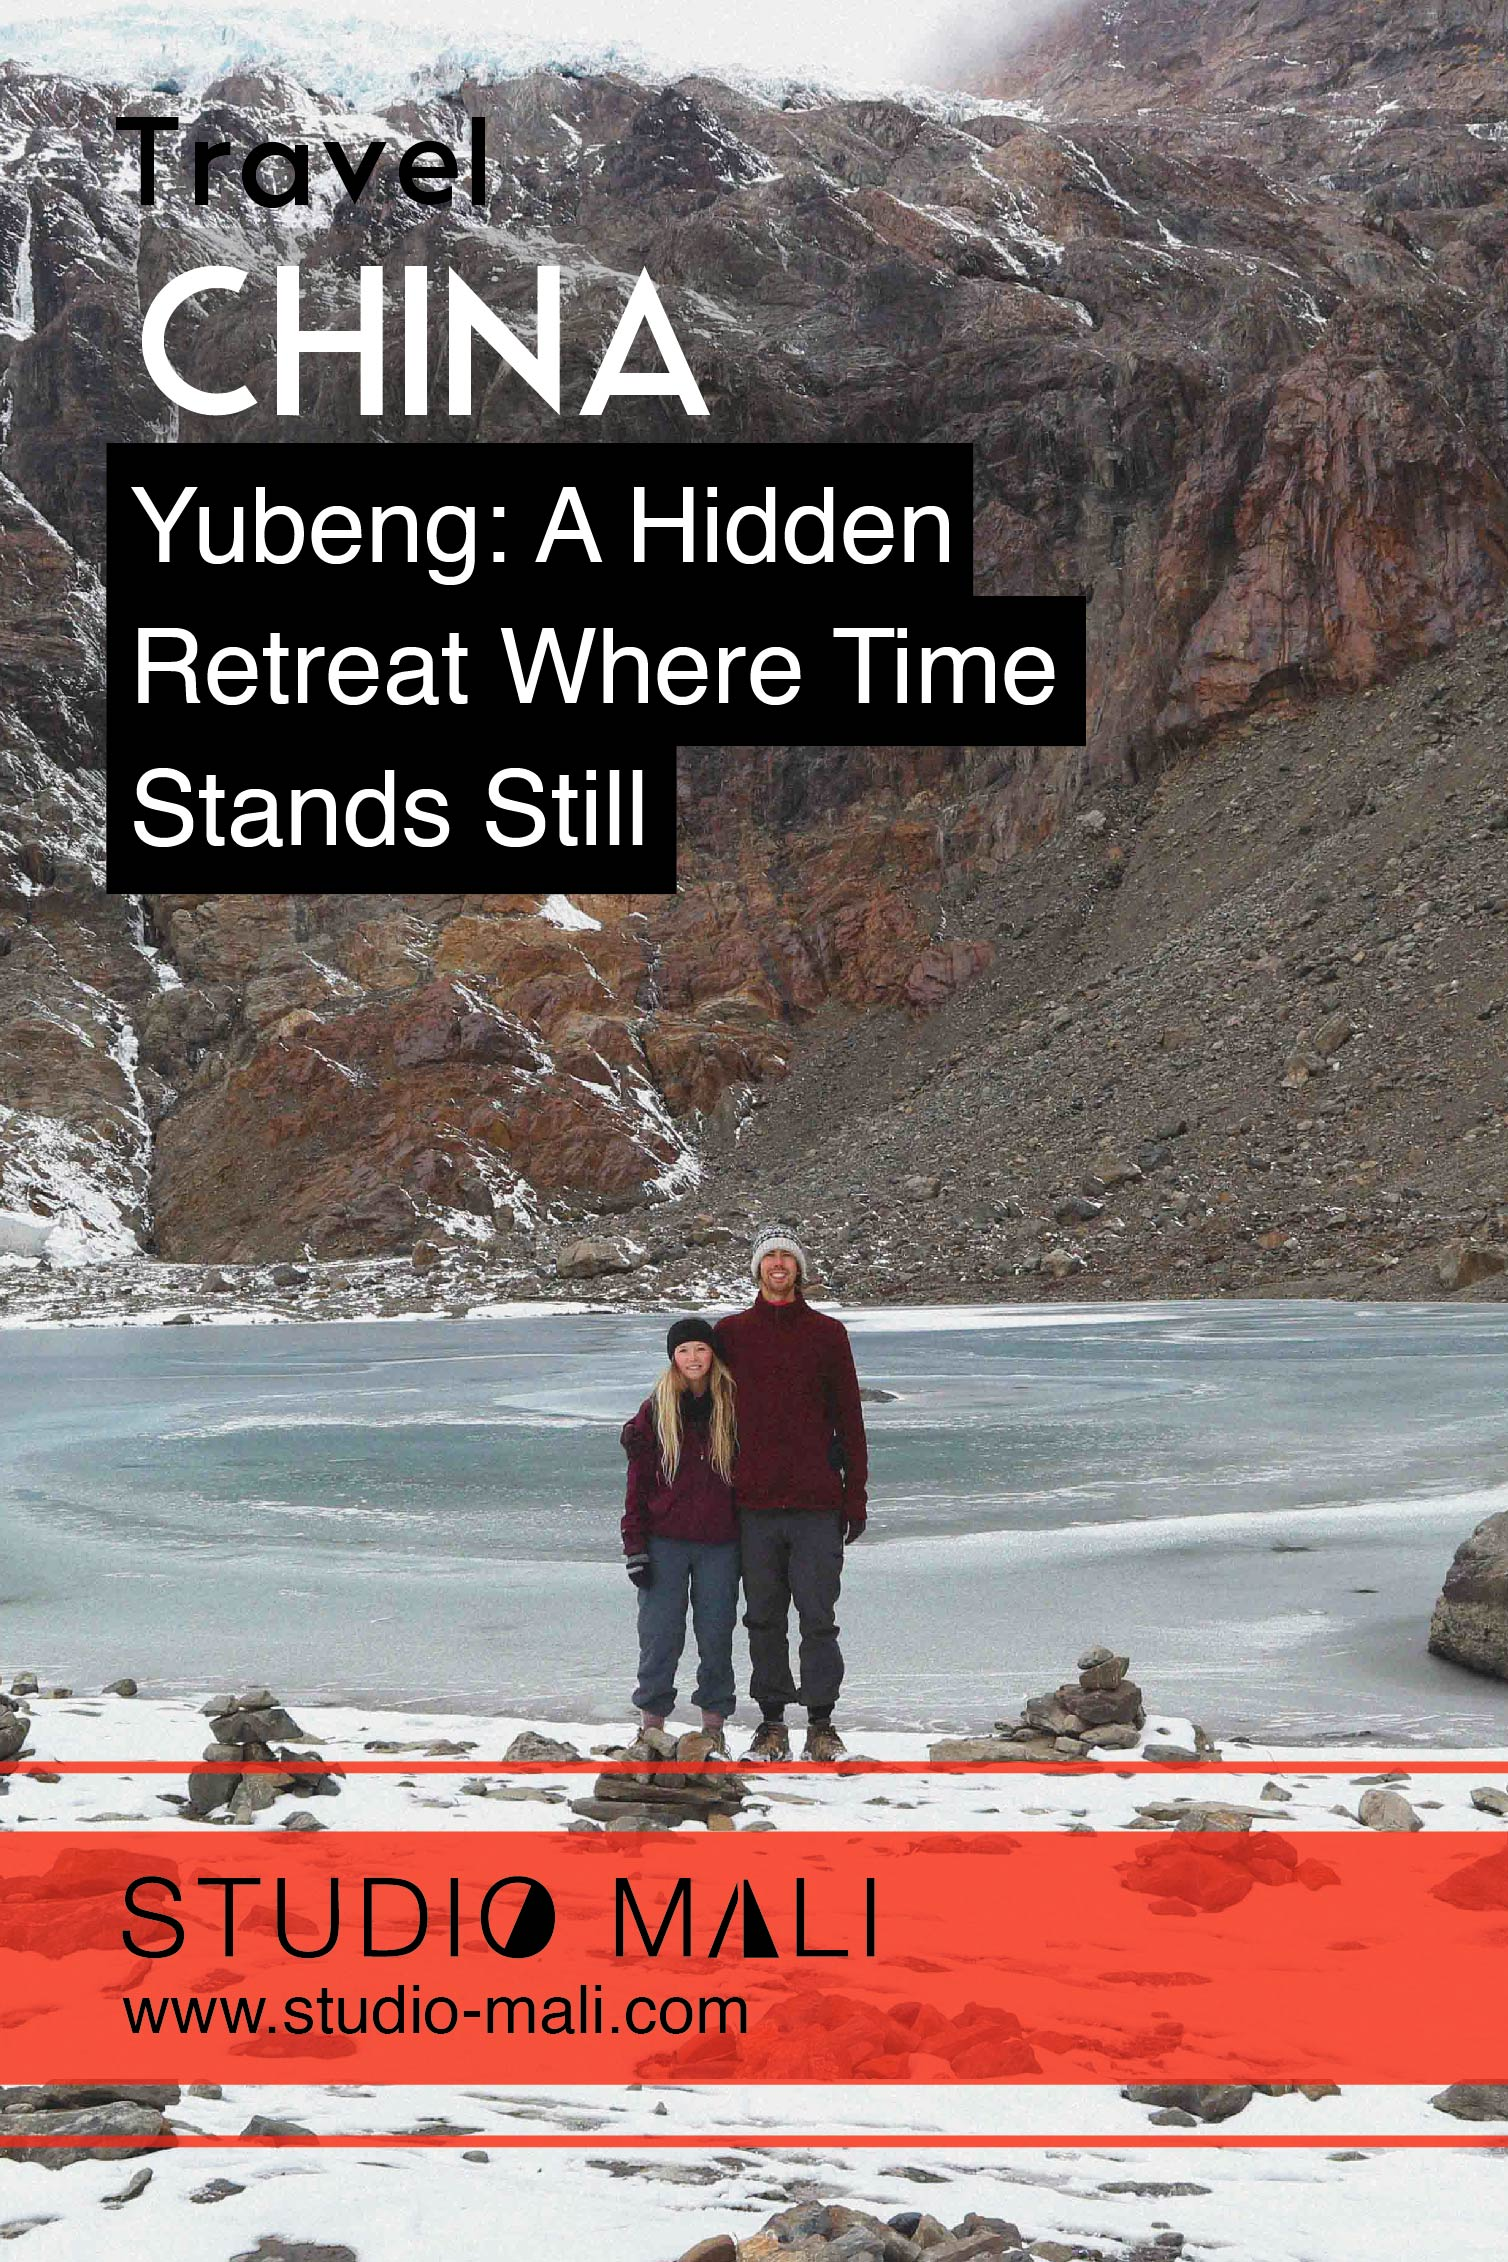 China - Yubeng - A Hidden Retreat Where Time Stands Still, by Studio Mali.jpg